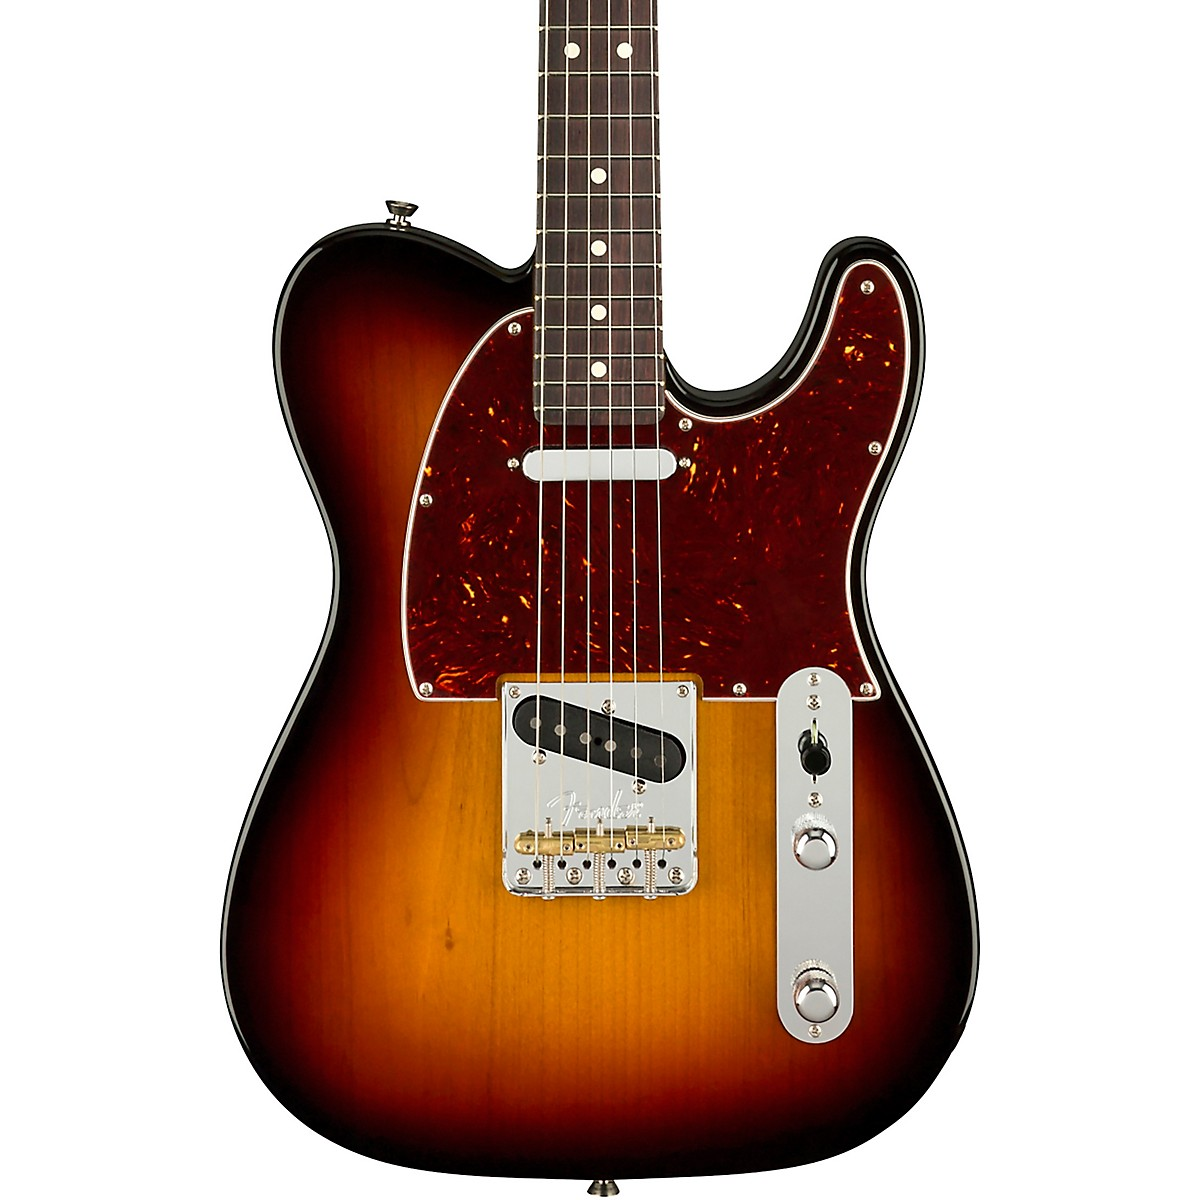 Fender American Professional II Telecaster Rosewood Fingerboard Electric Guitar